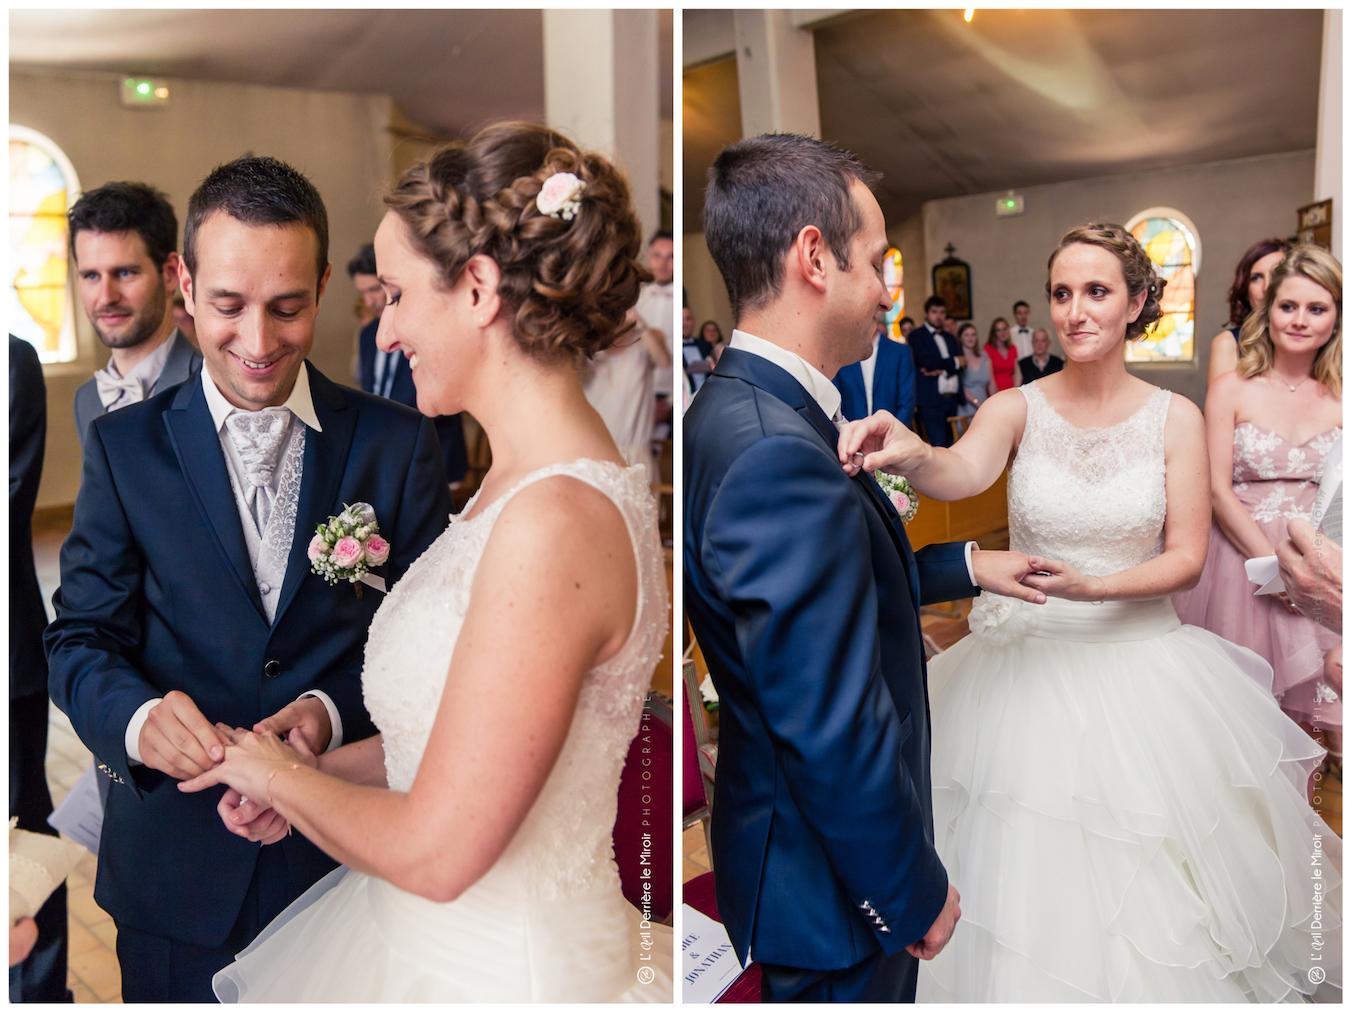 photographe-mariage-06-chateau-vaugrenier-12